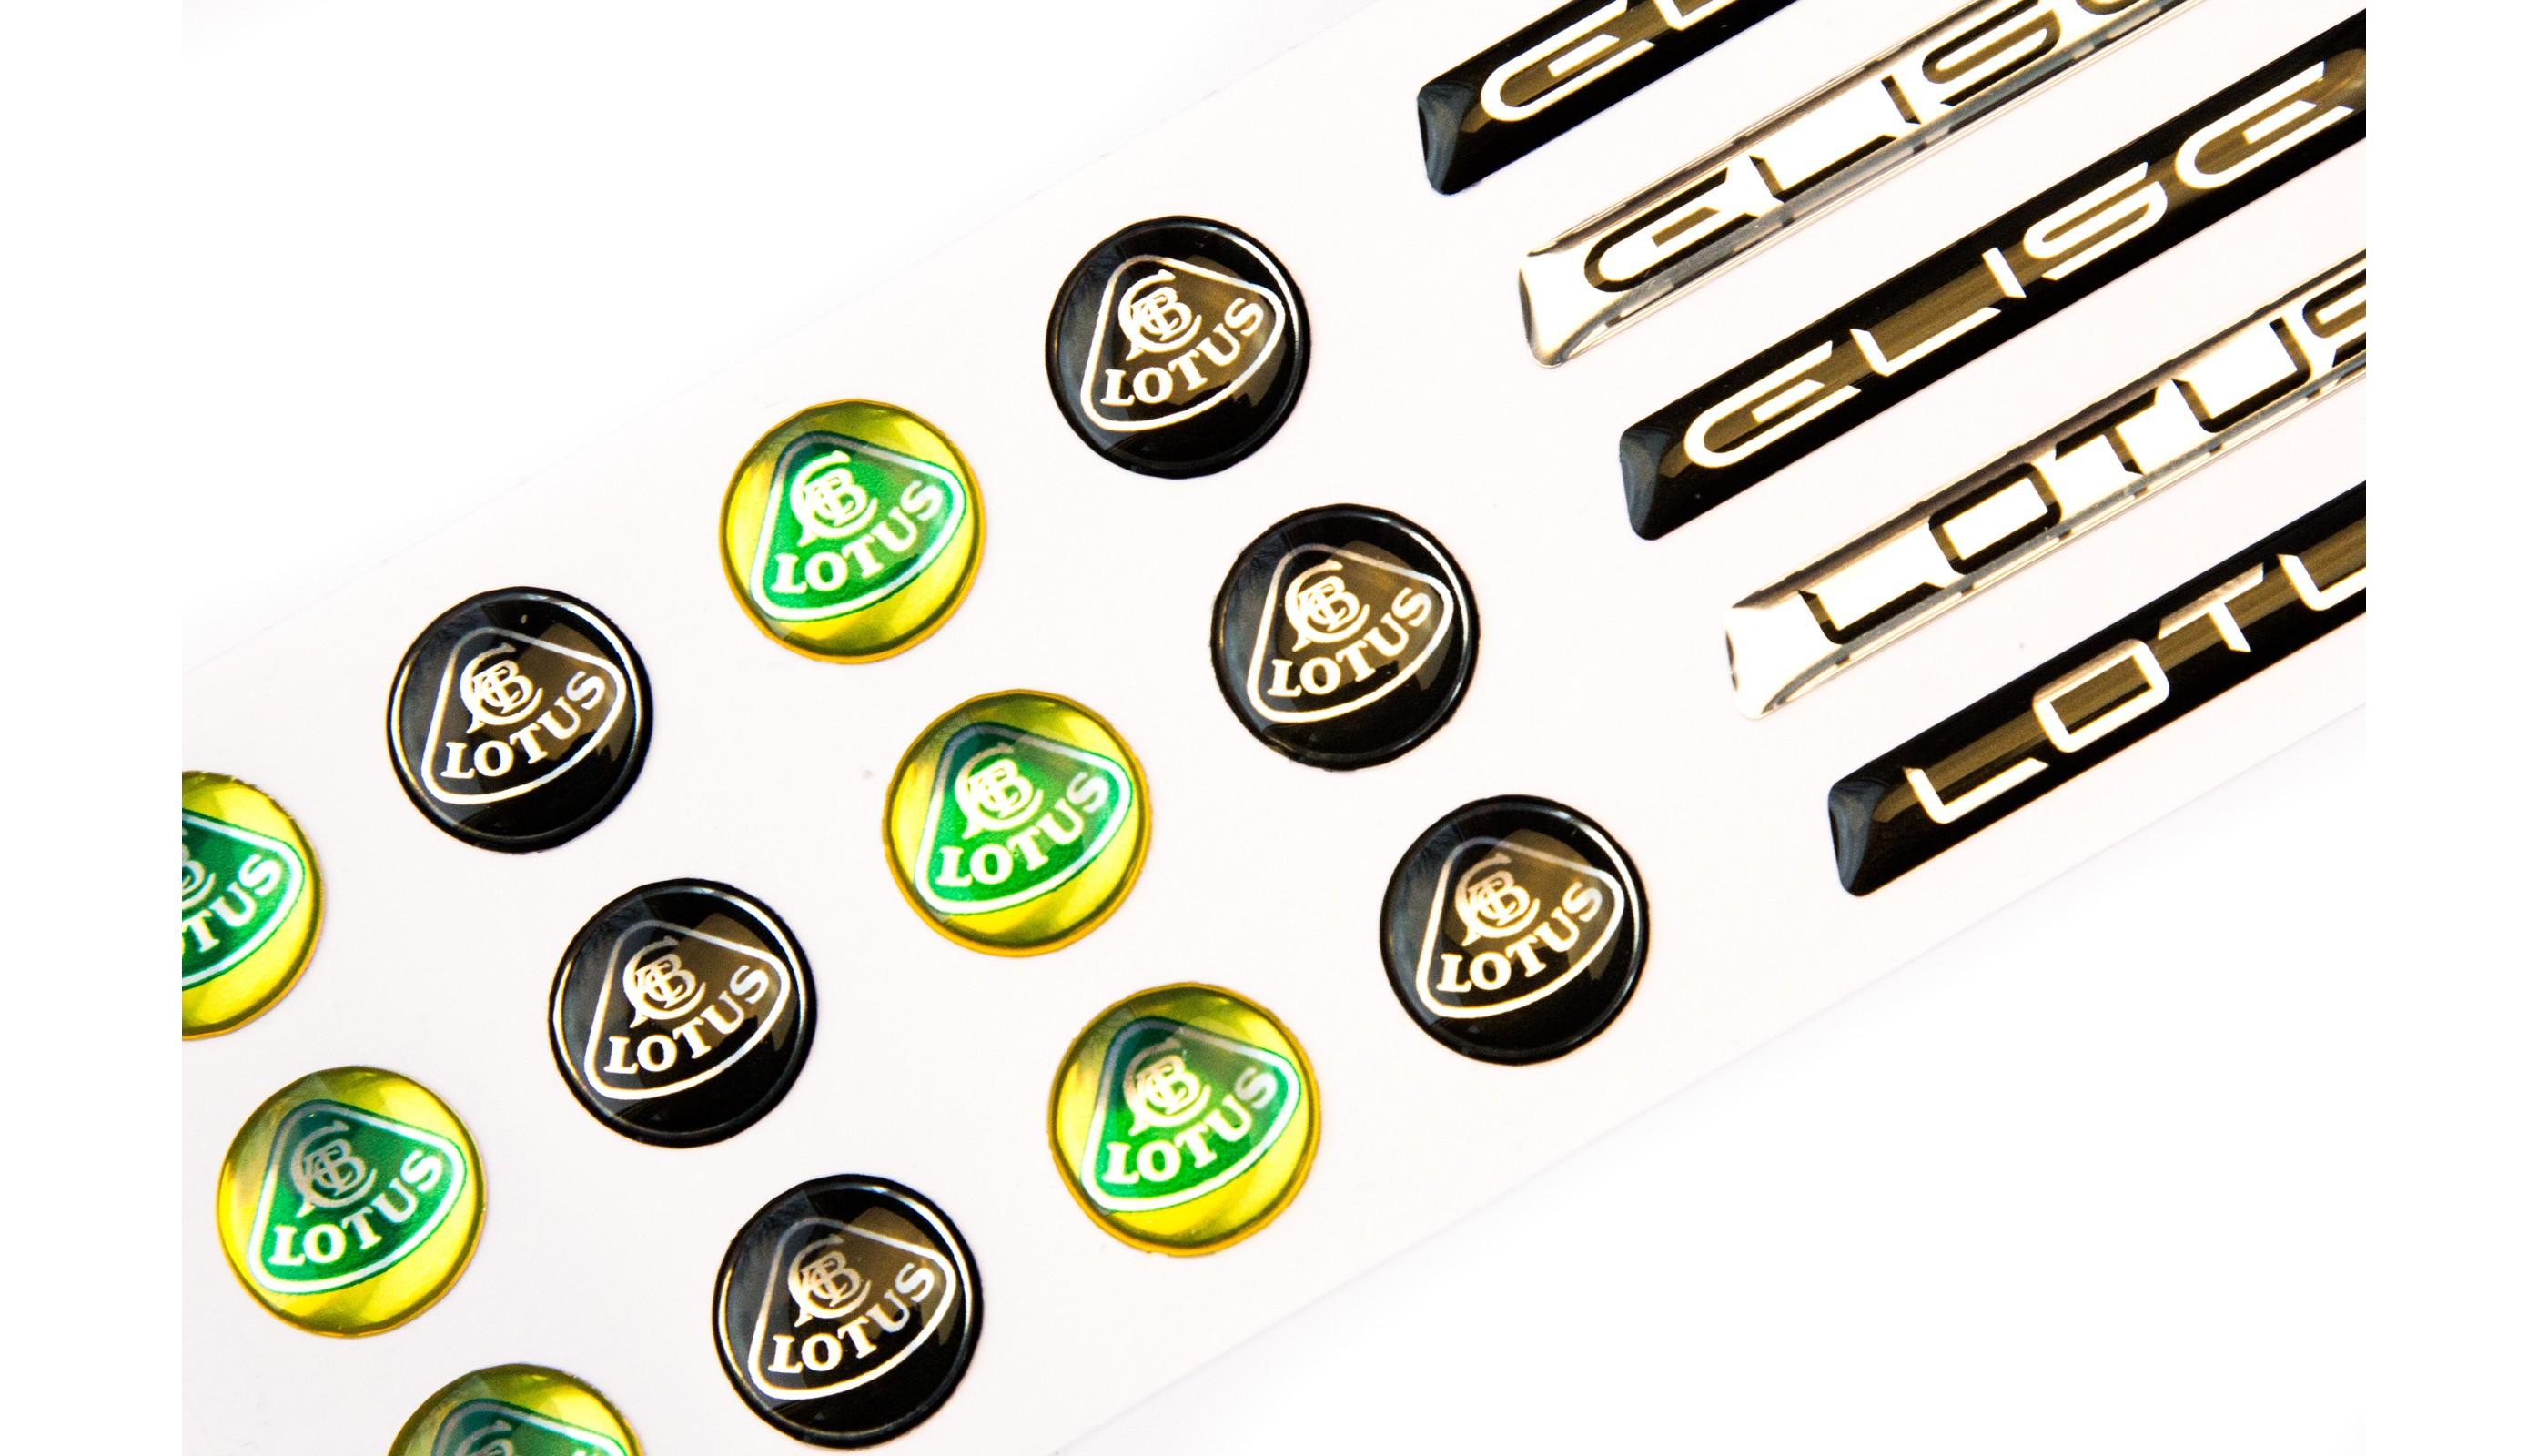 Lotus Domed Key Emblems